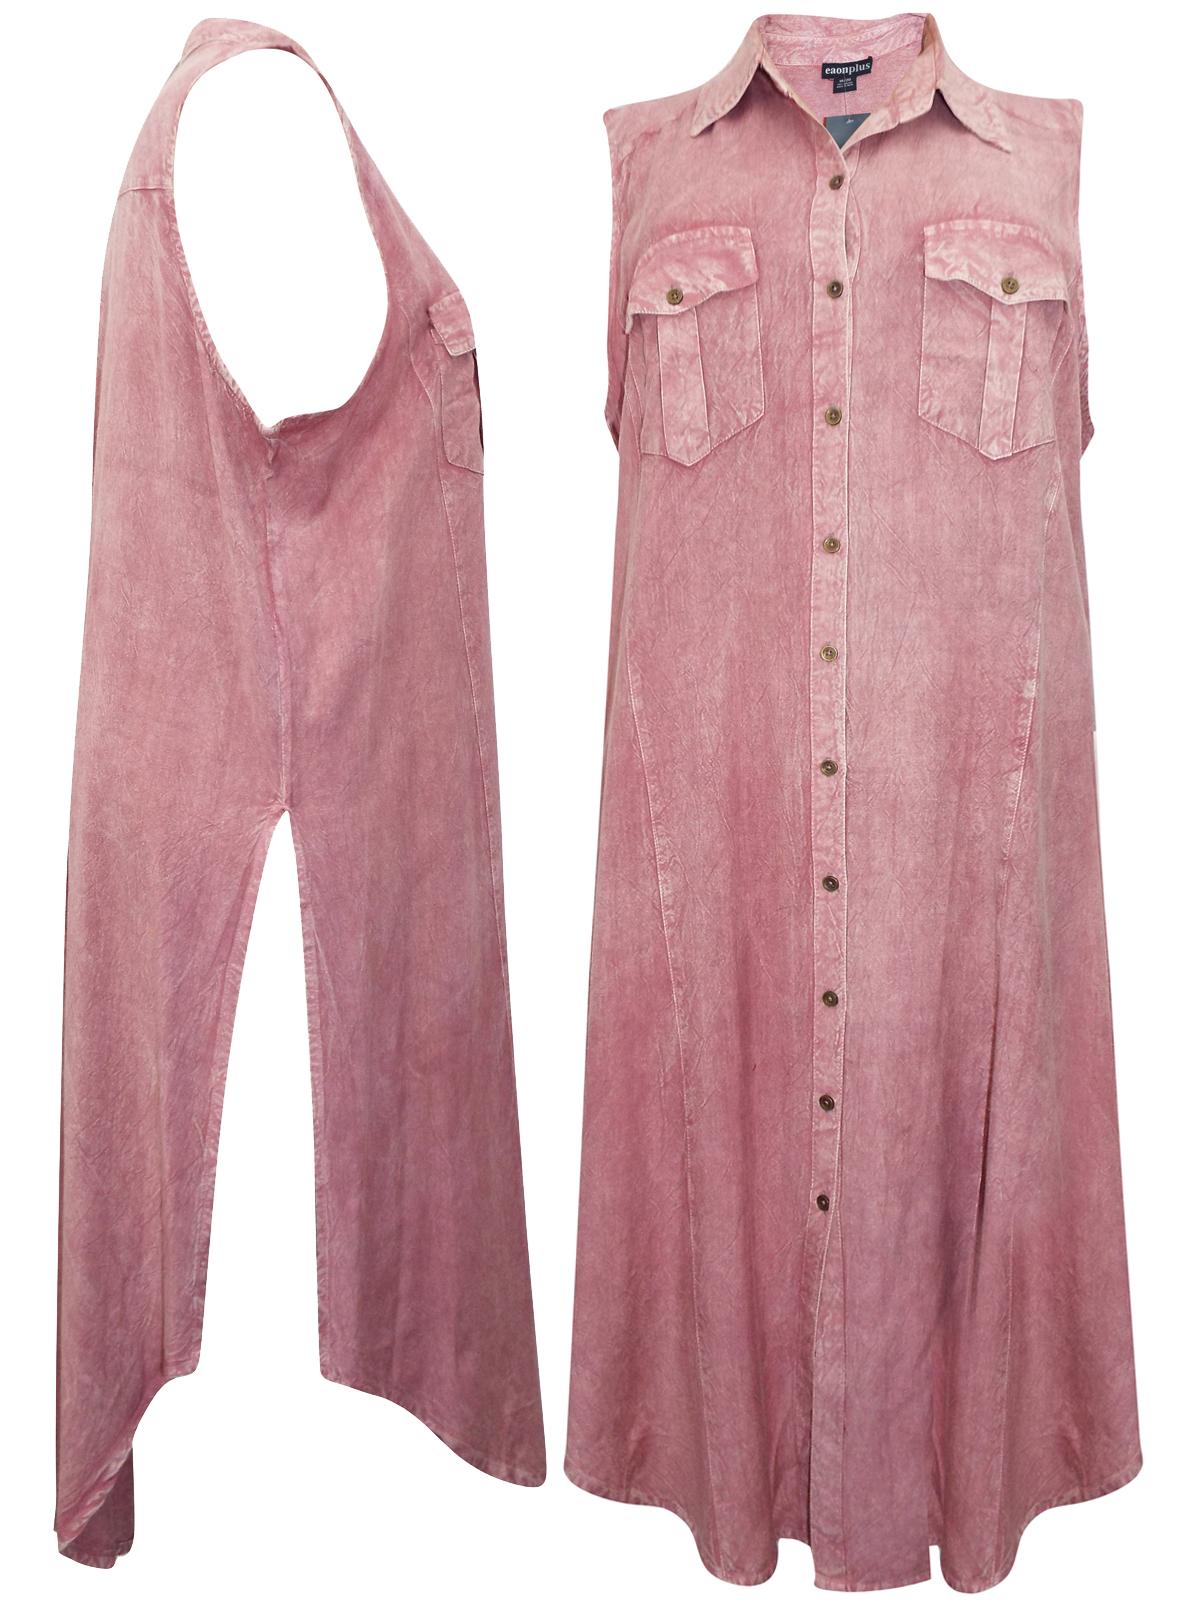 Eaonplus Vintage Rose Sleeveless Collared Shirt Dress Plus Size